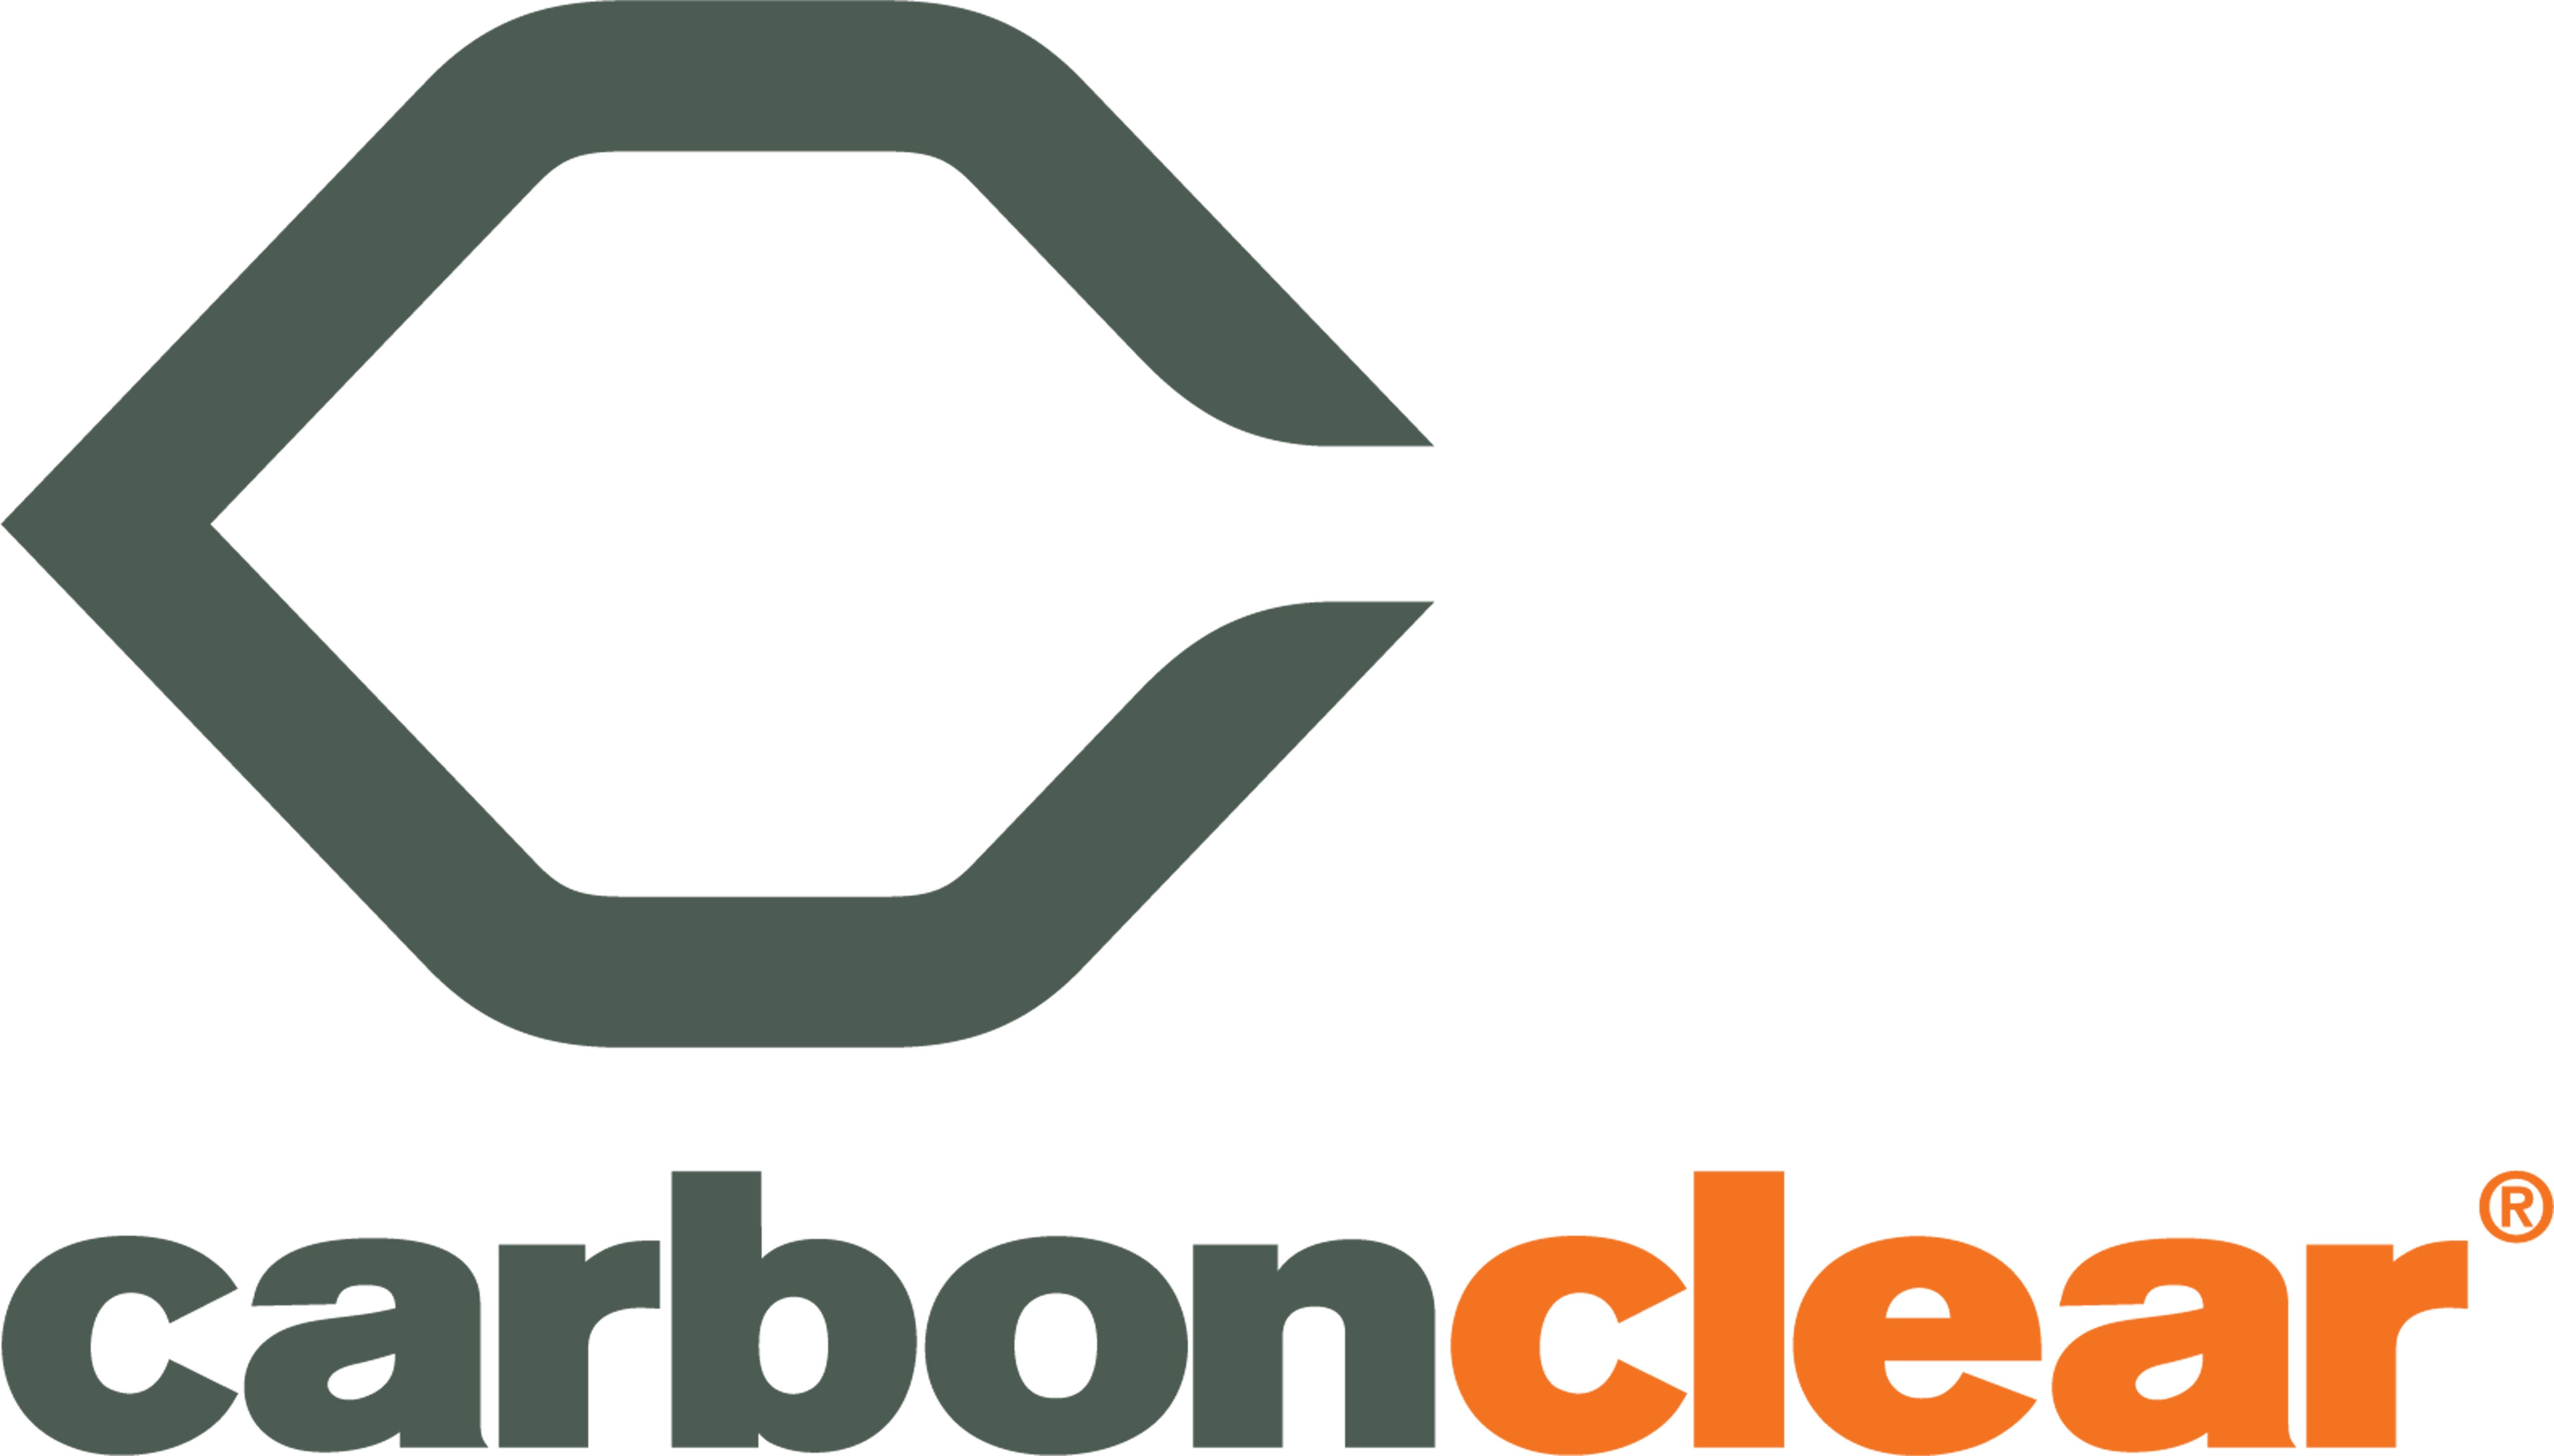 carbon_clear logo